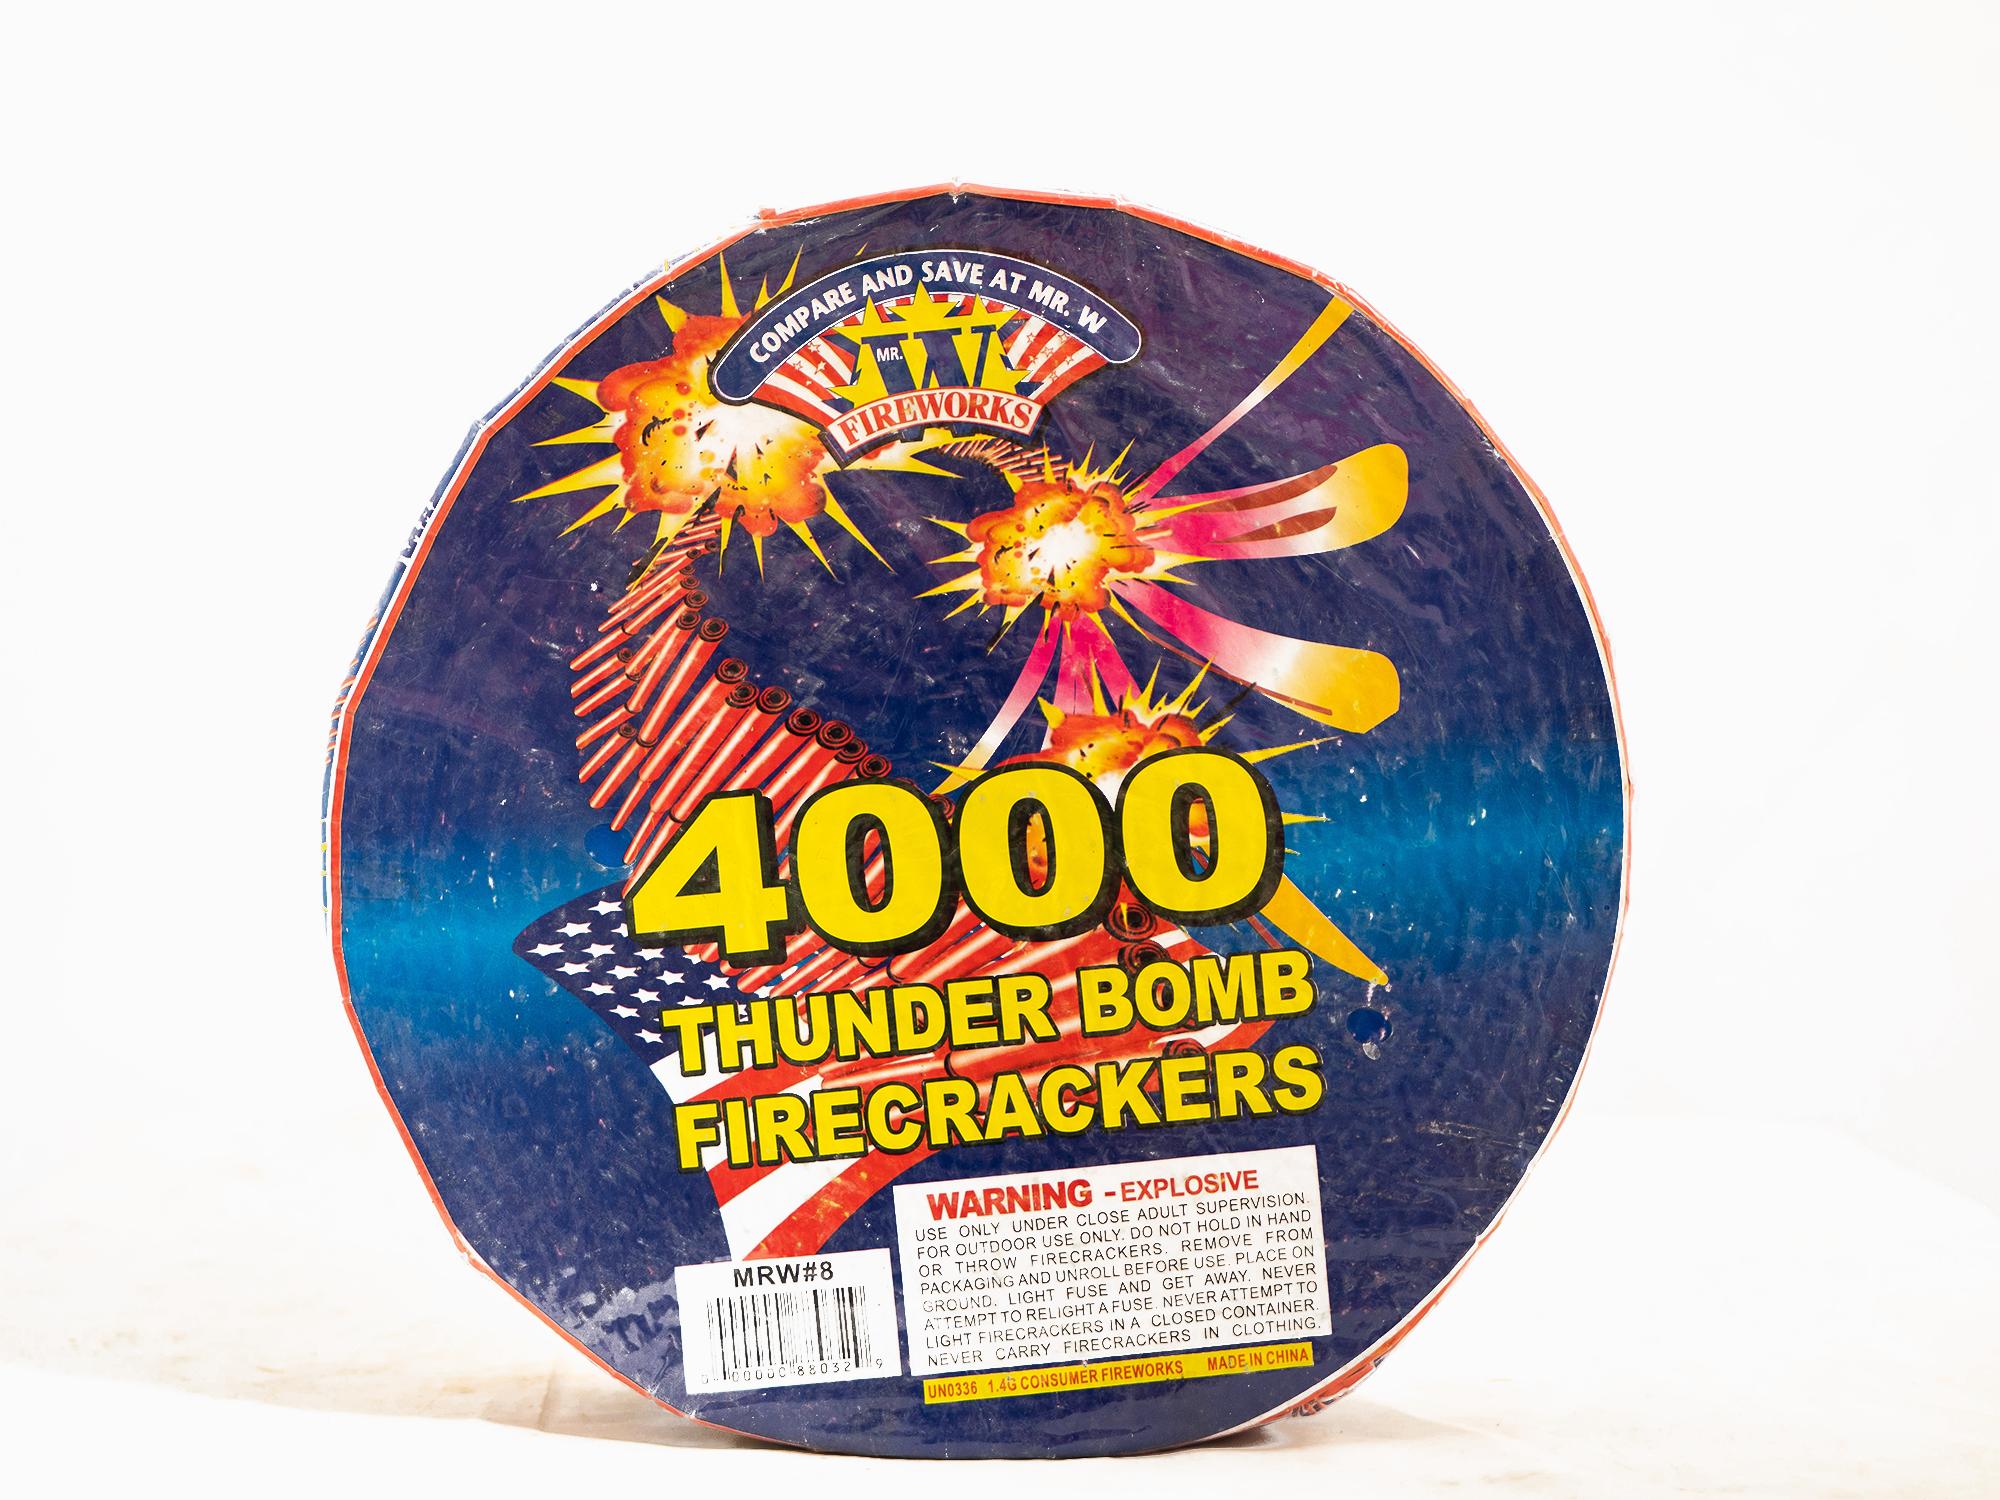 4,000's